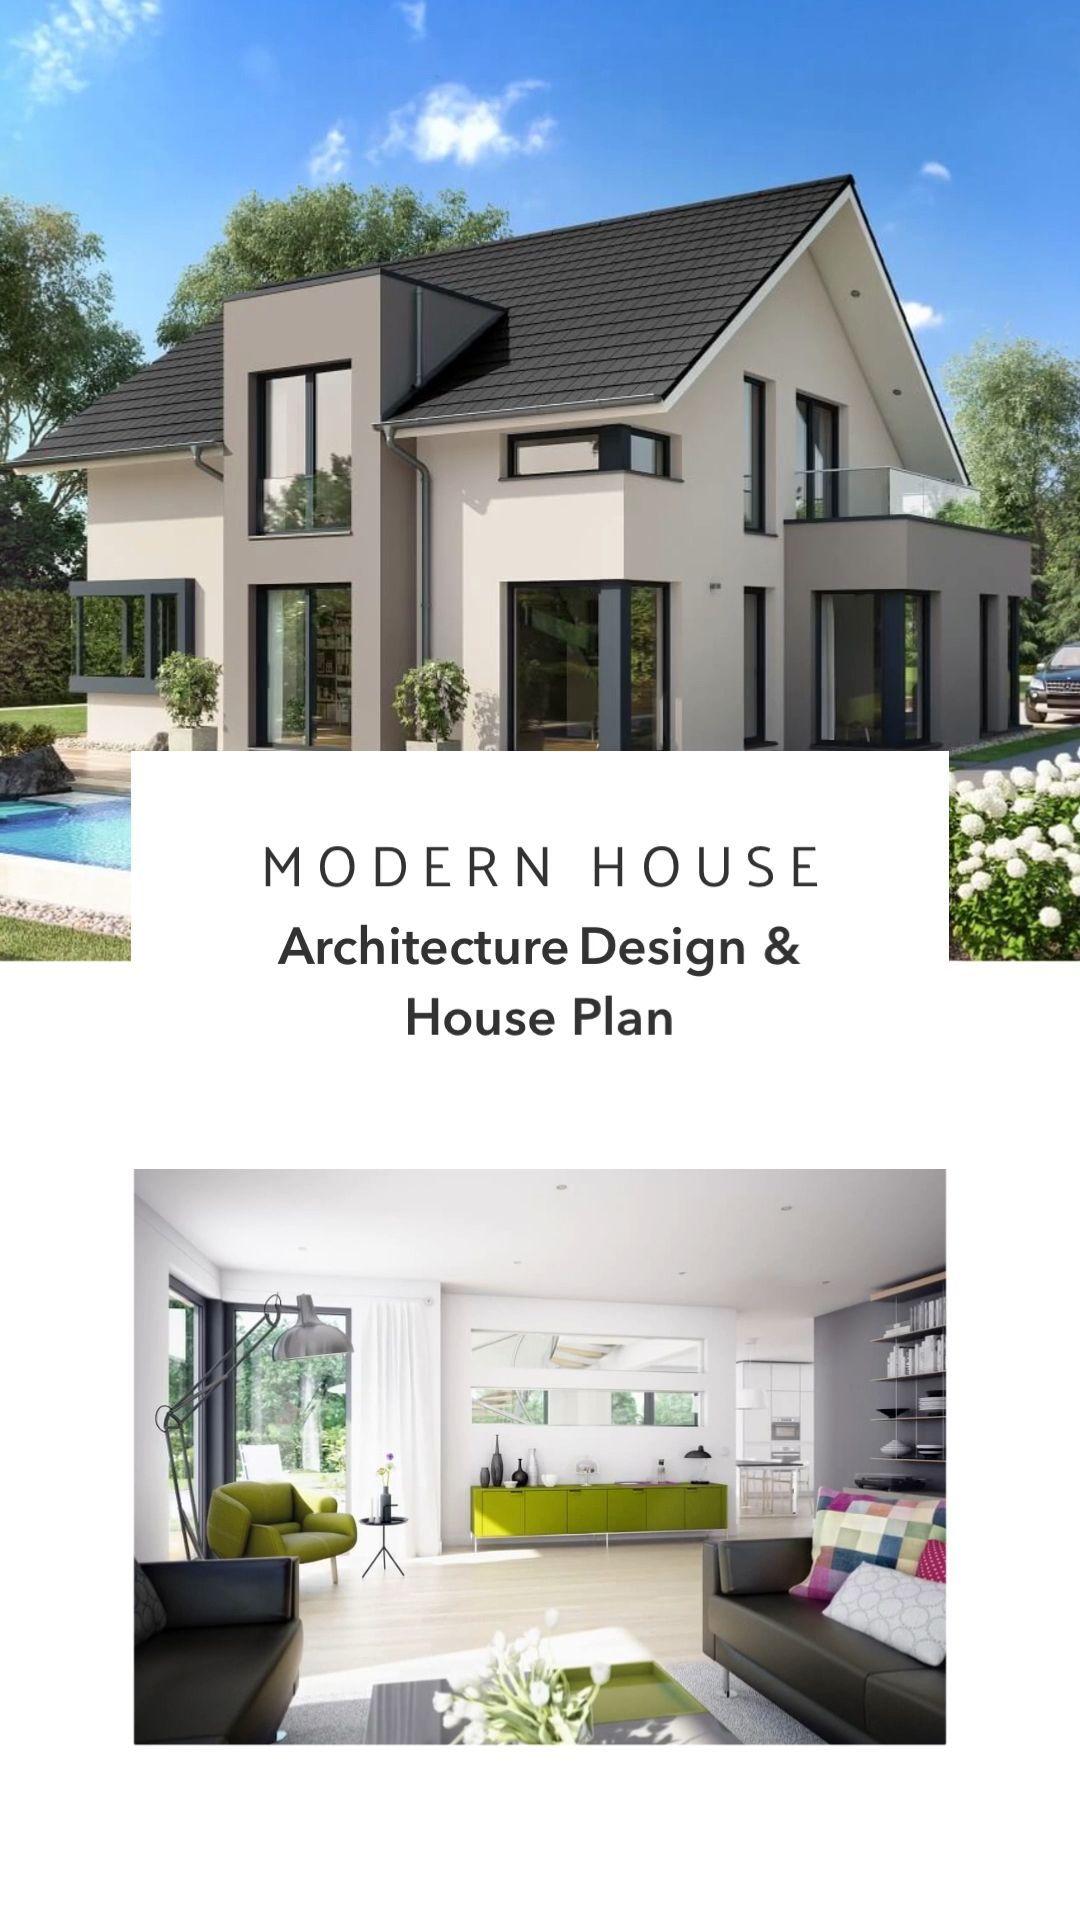 Modern Architecture Home Plan Design Interior Ideas Architecture Design Ideas Interior Modern Family House Modern Architecture House Architecture House